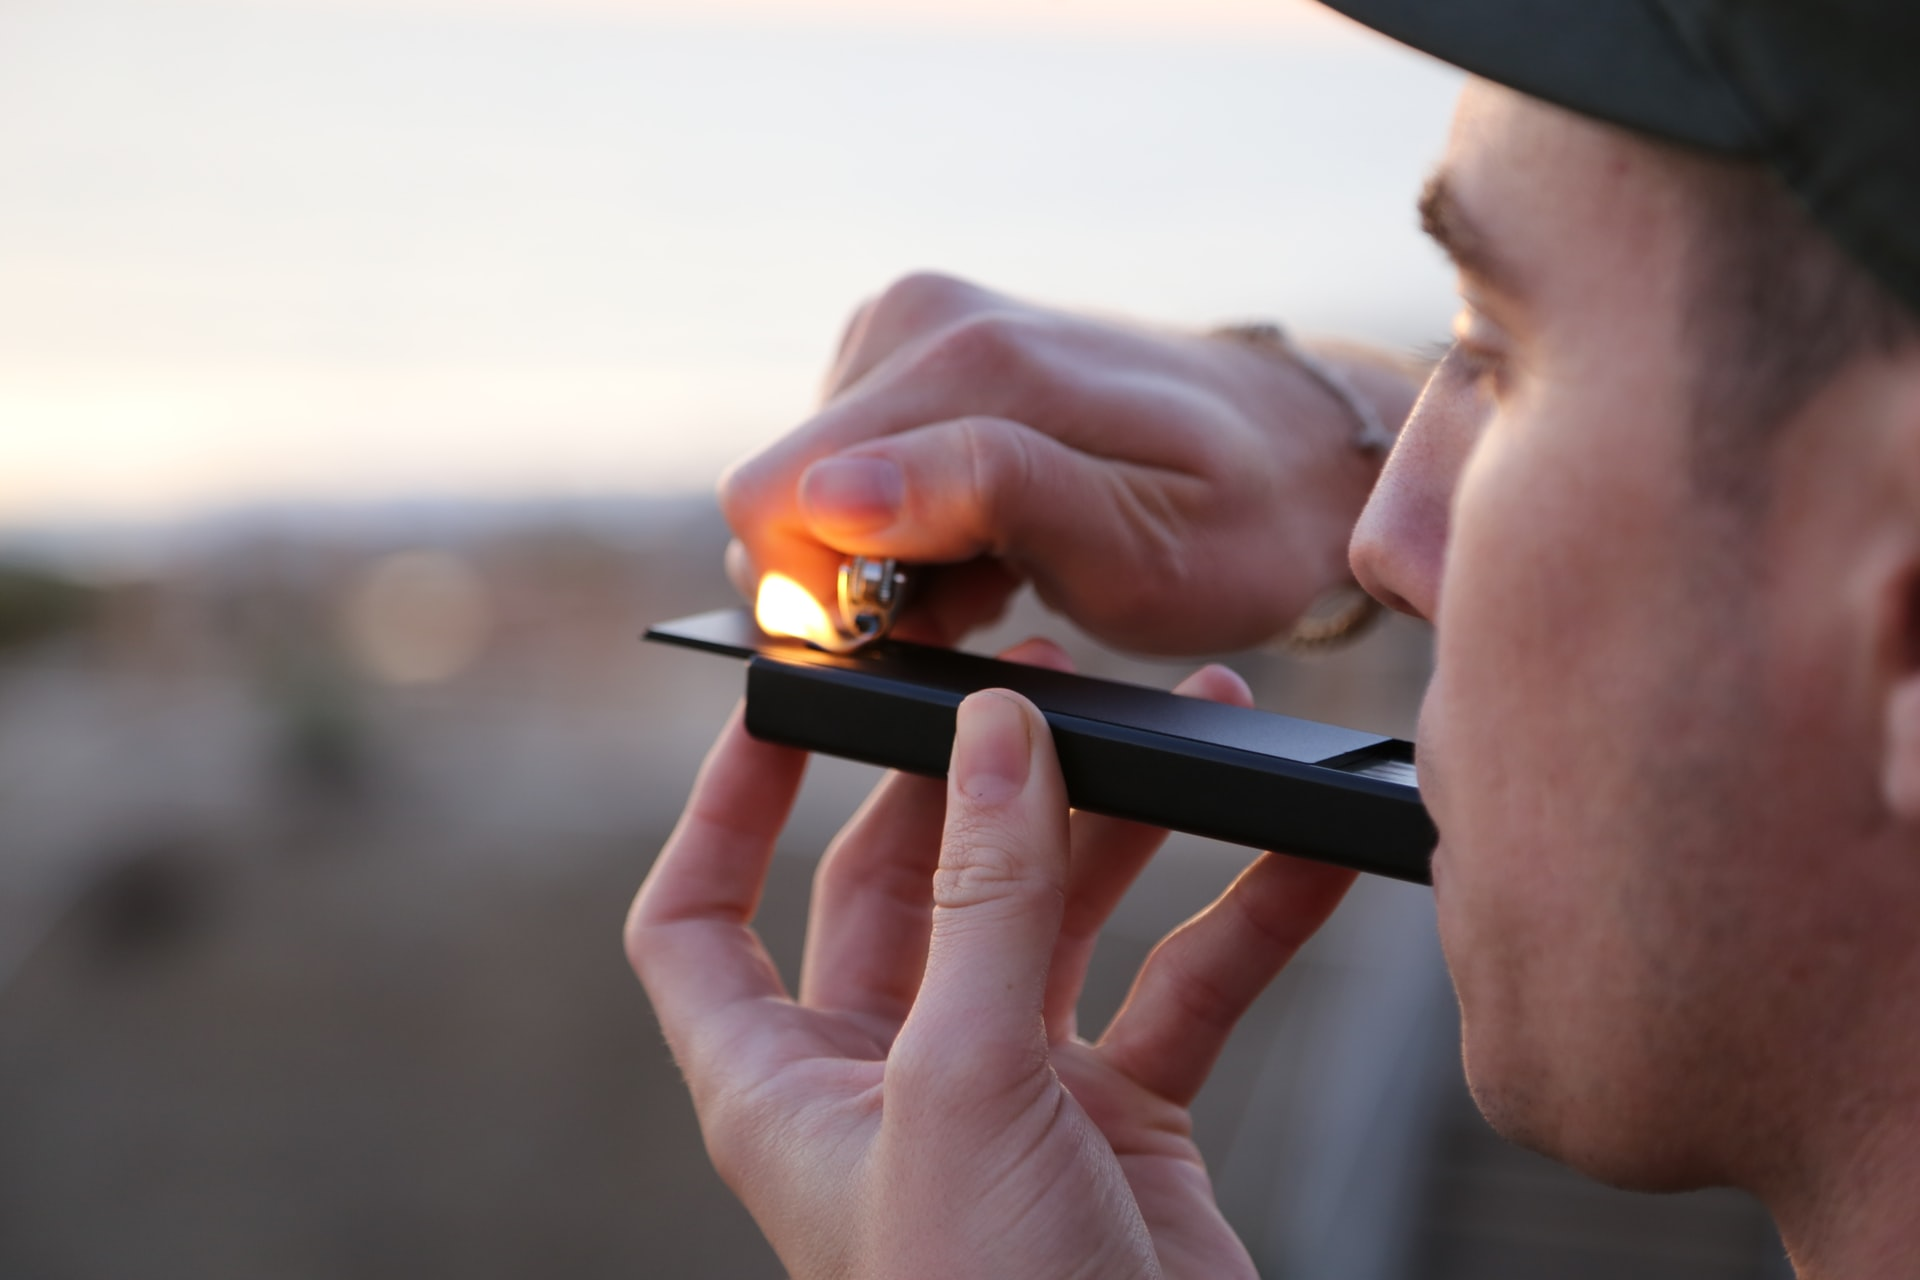 Ten million more Americans smoke marijuana